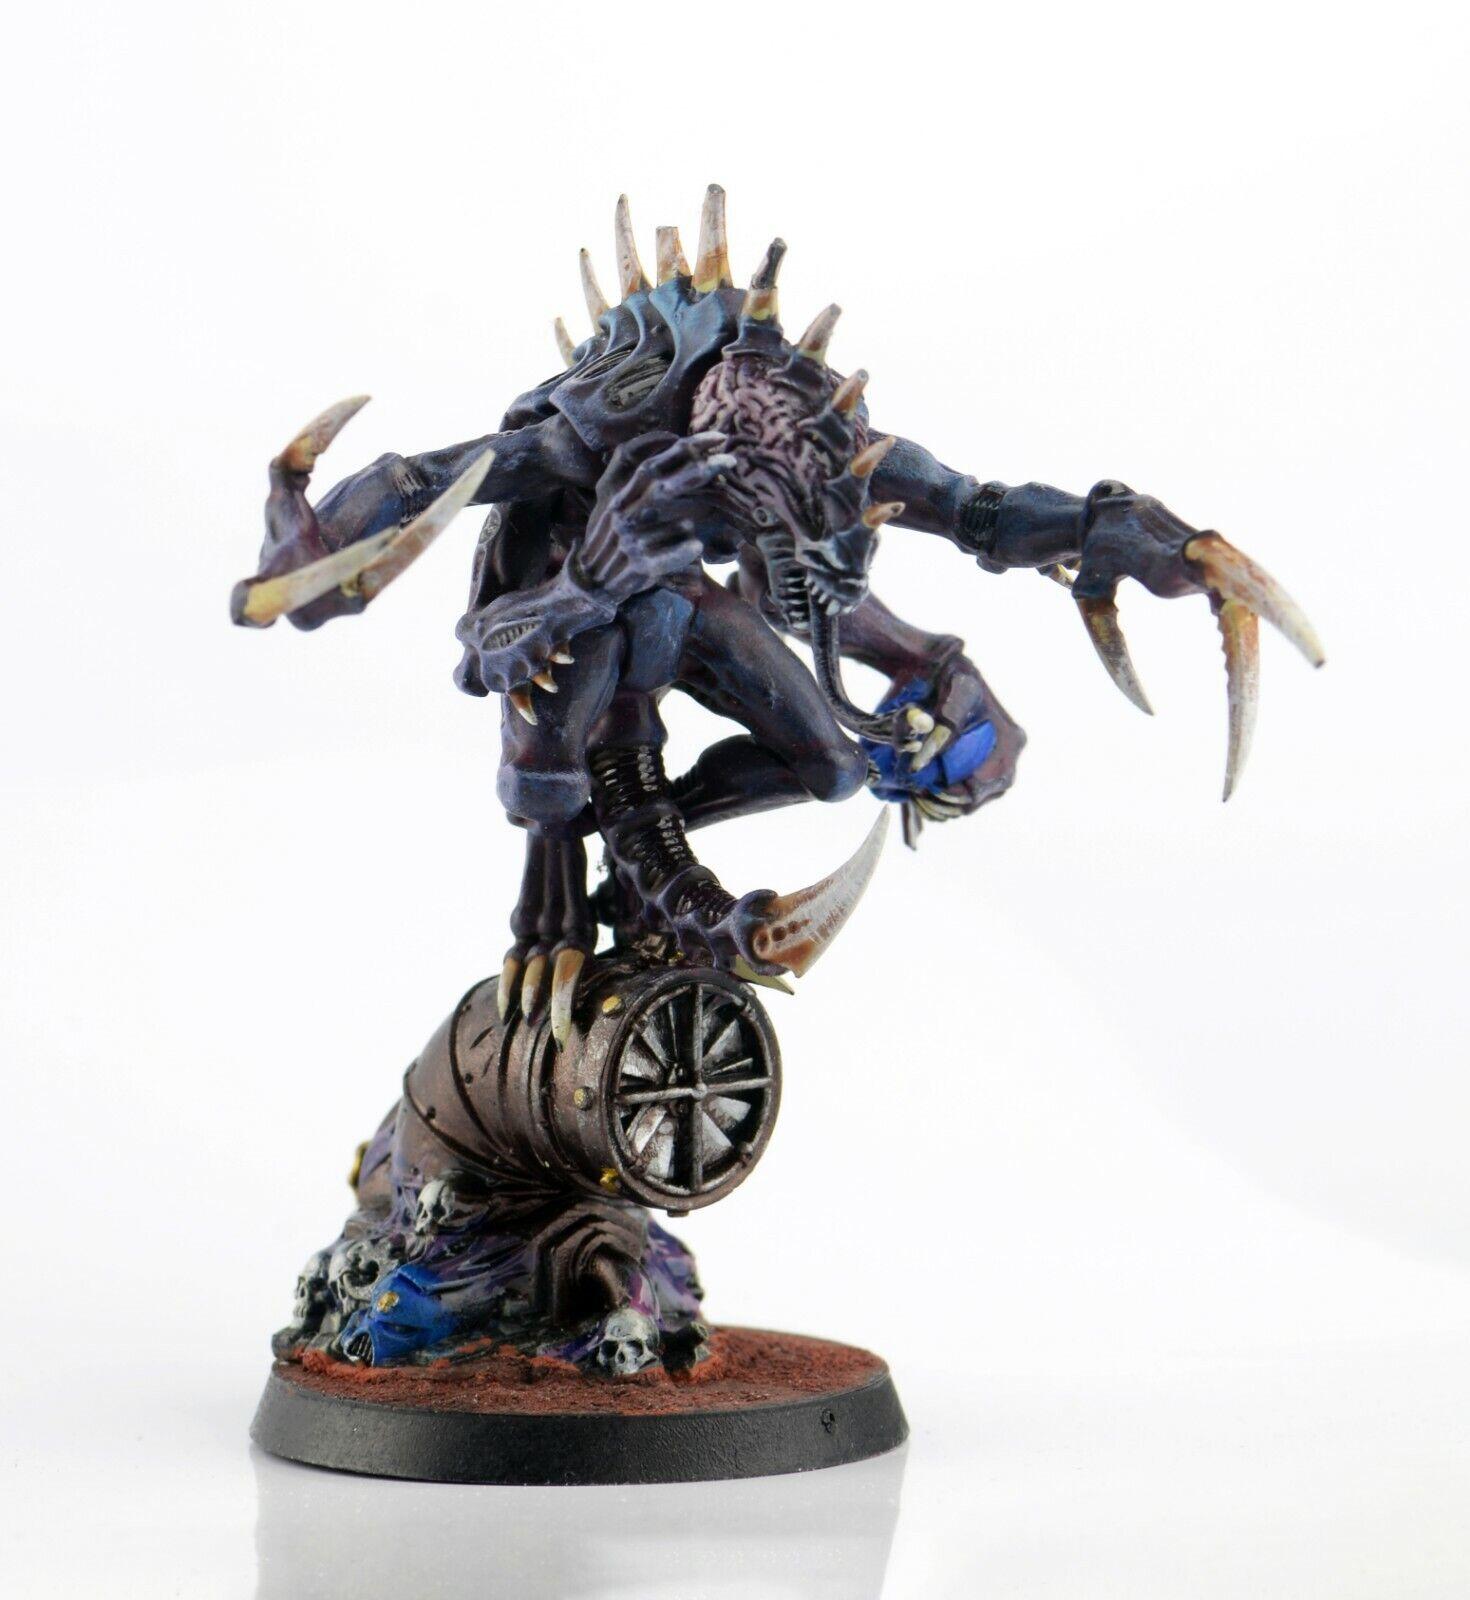 benvenuto a scegliere Warhammer 40K 40K 40K Tyranids Genestealer Cults Patriarch  vendita online